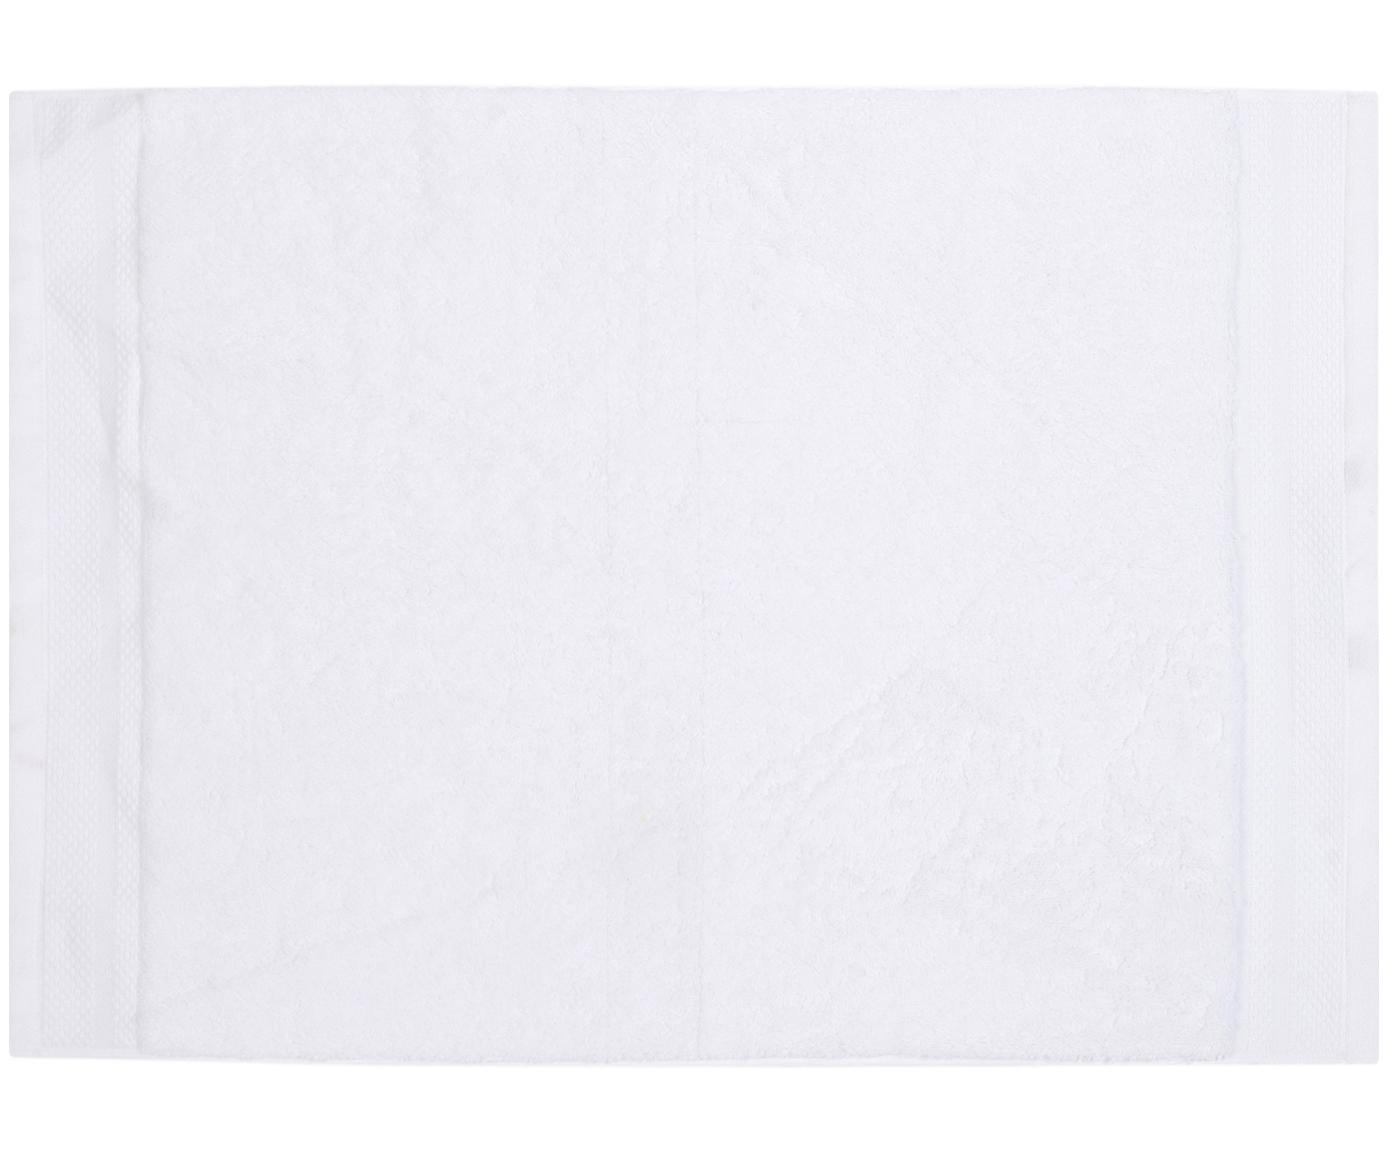 Alfombrilla de baño Premium, antideslizante, 100%algodón Gramaje superior 600g/m², Blanco, An 50 x L 70 cm